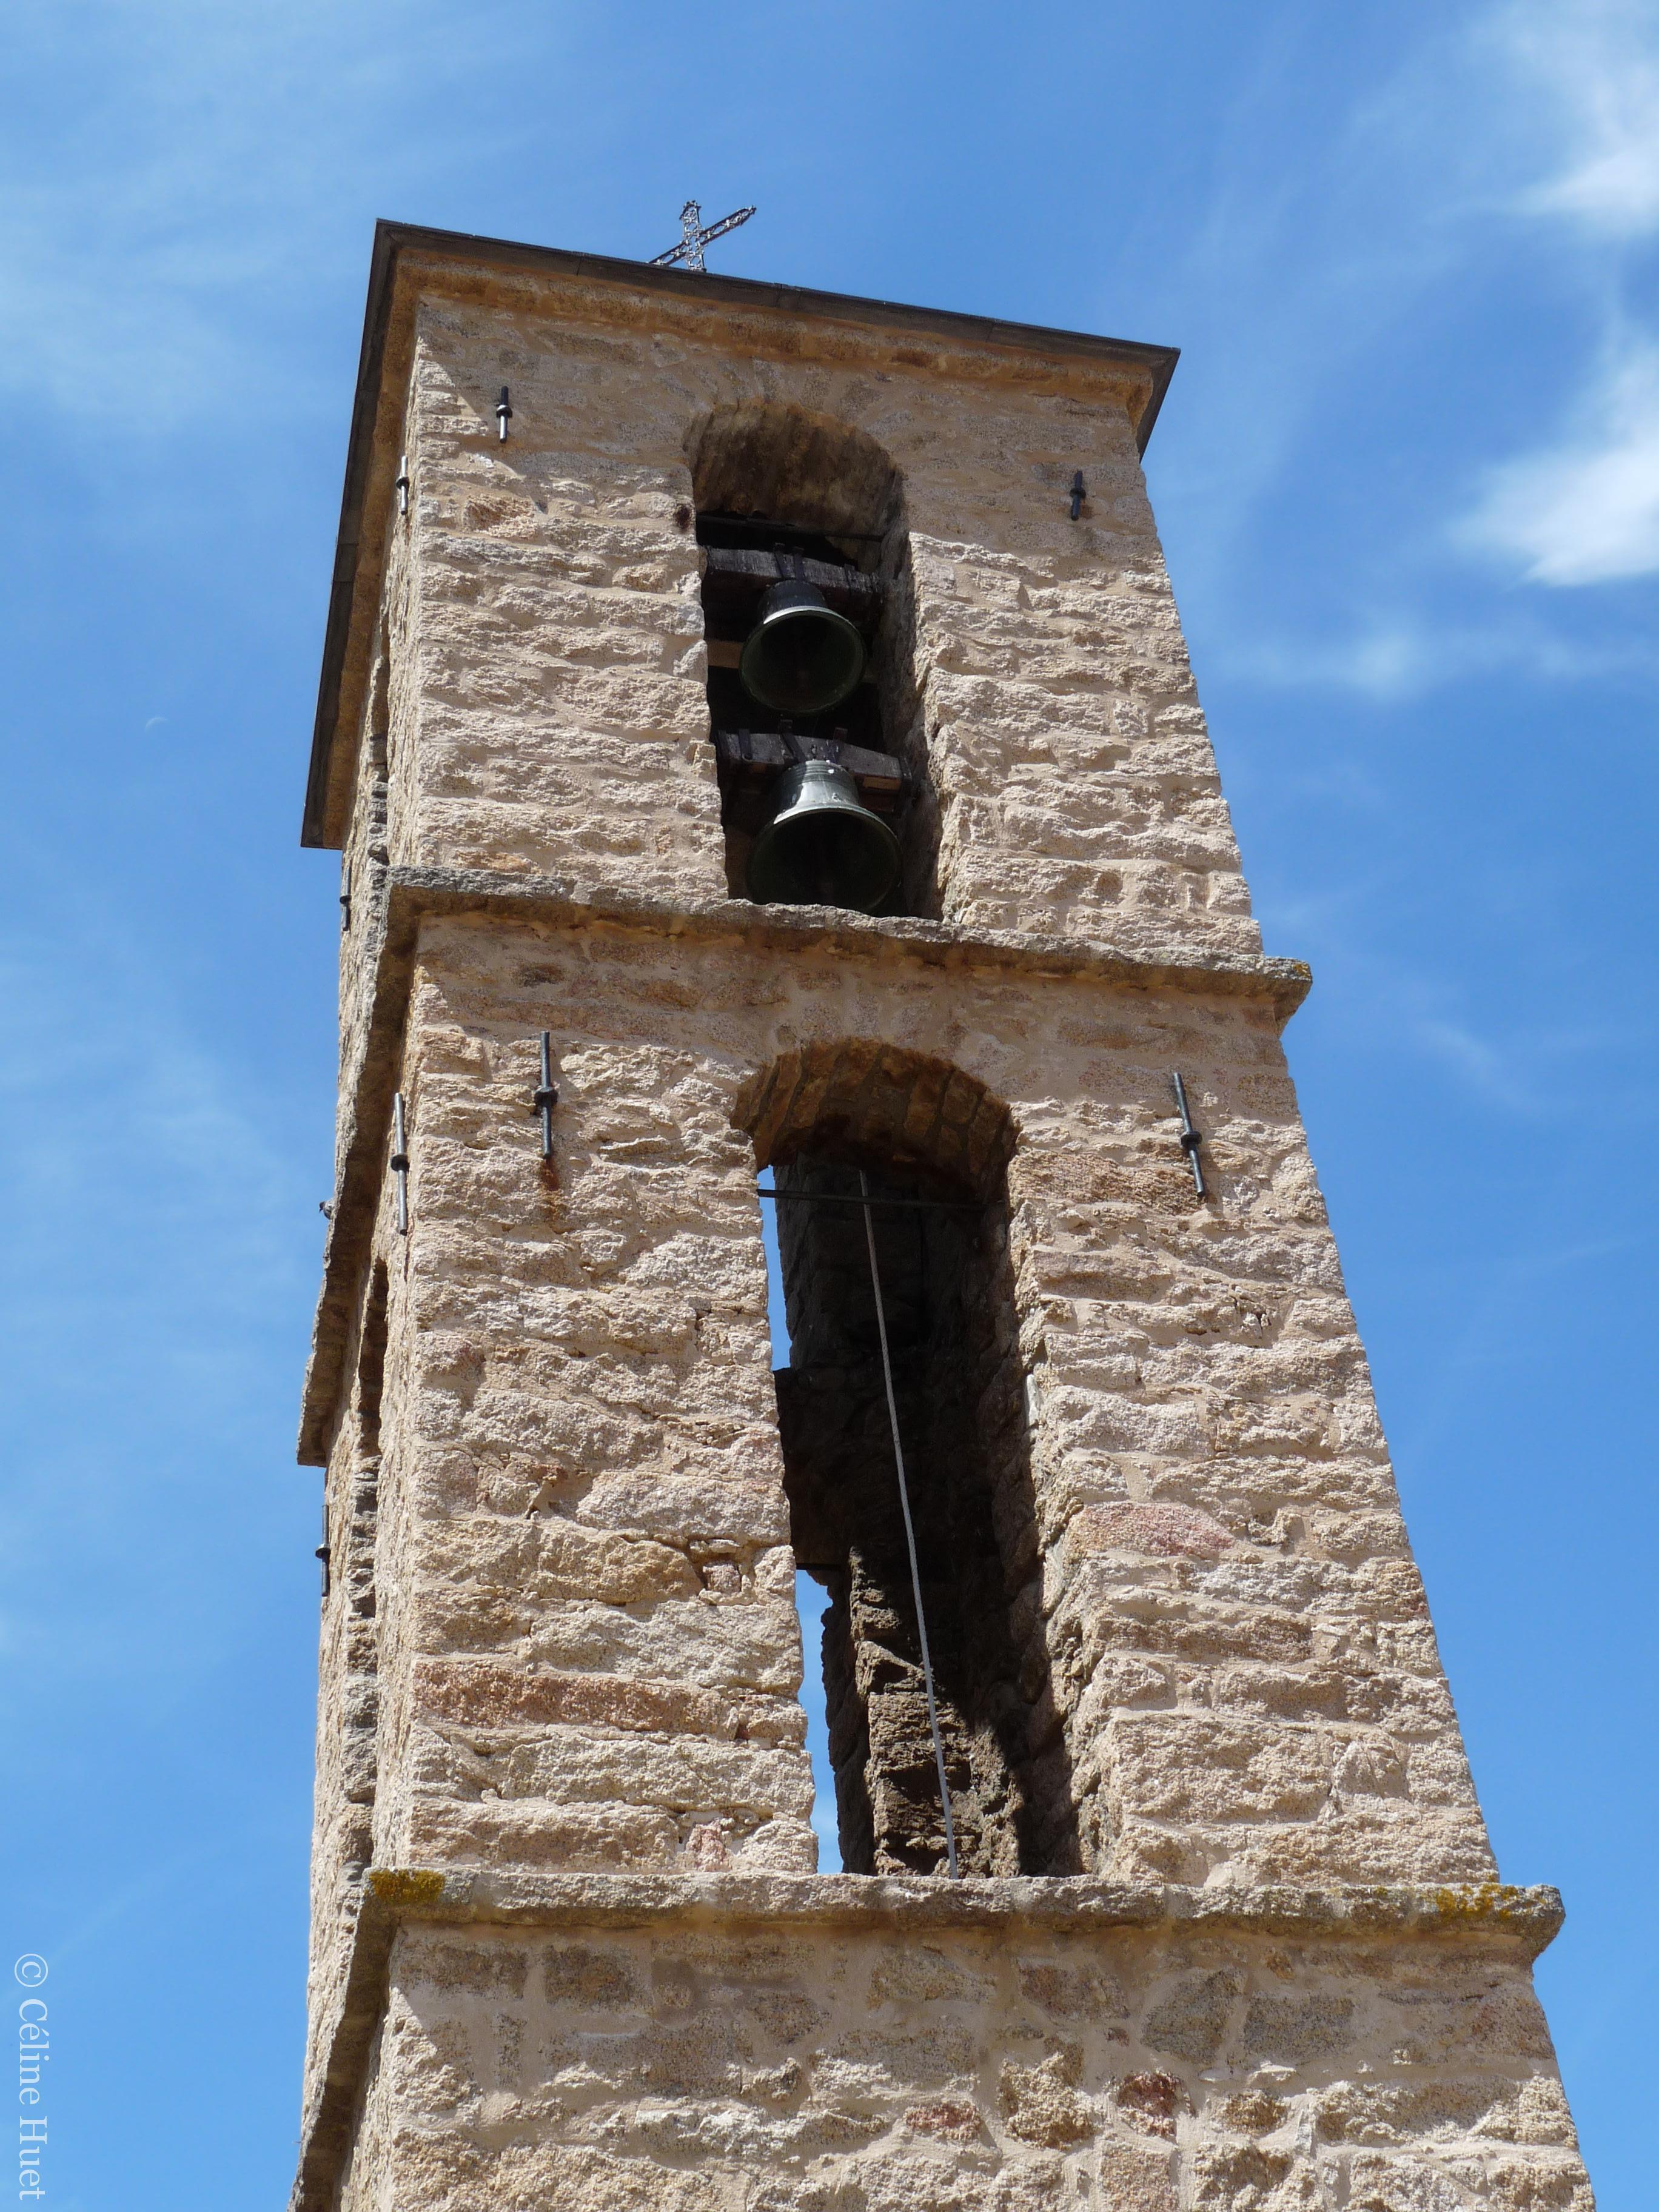 Villanova Corse du Sud France